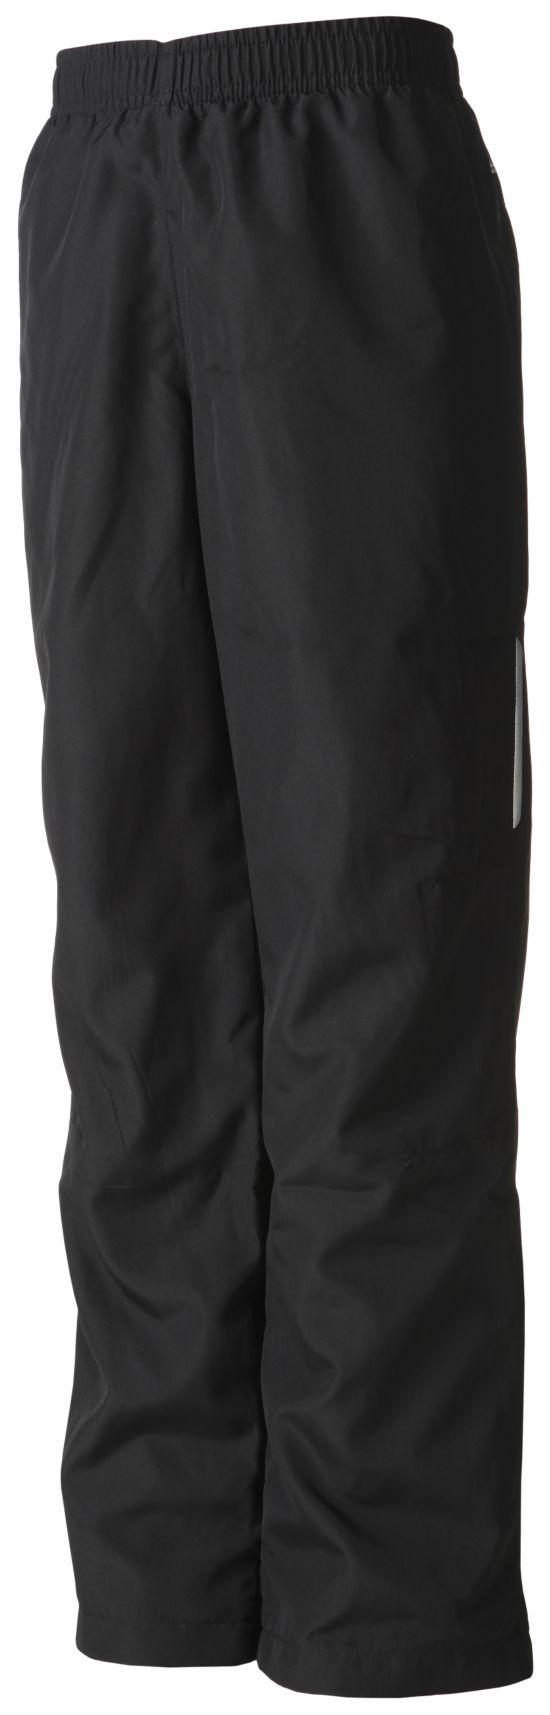 FS Porterio Woven Bukse Junior BLACK